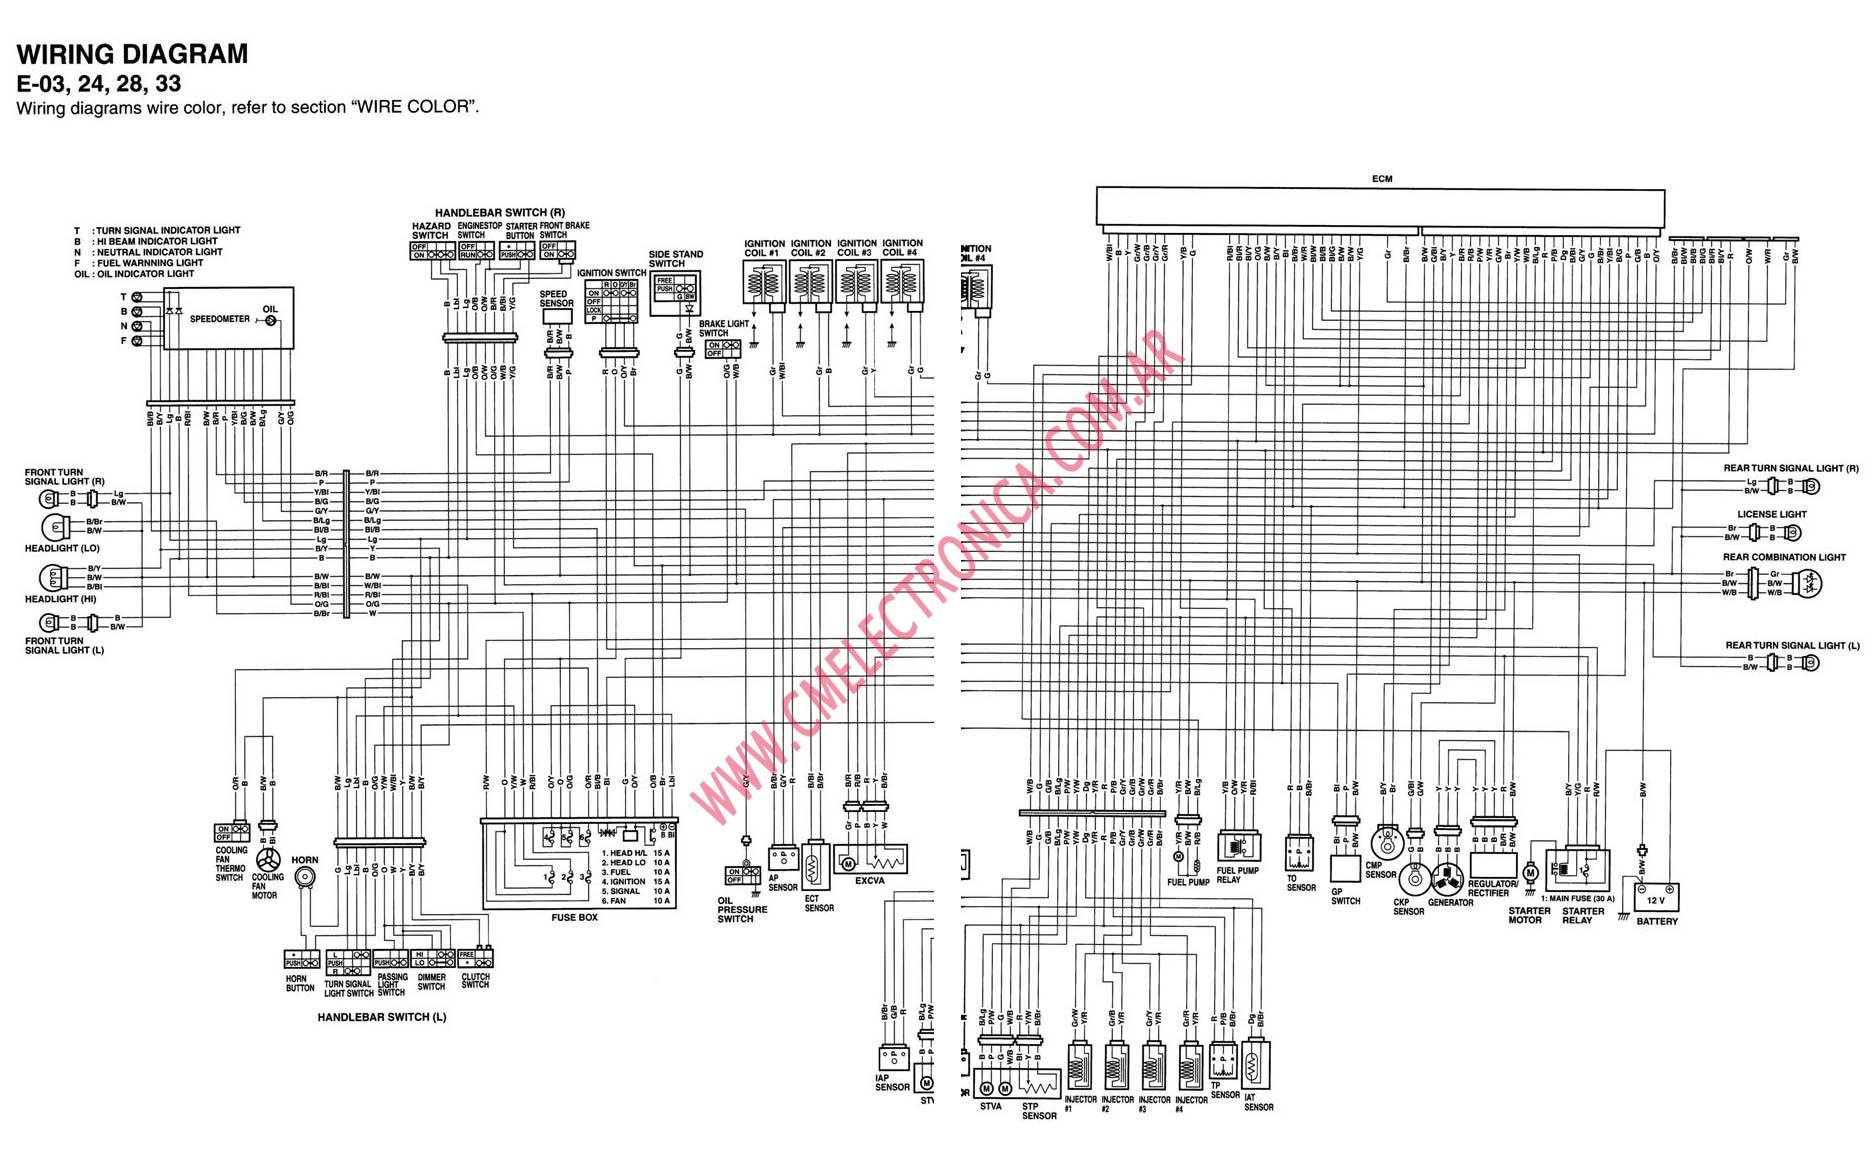 2007 Gsxr 600 Headlight Wiring Diagram Block And Schematic Diagrams \u2022 04  Gsxr 600 Wiring Diagrams Free Download Diagram